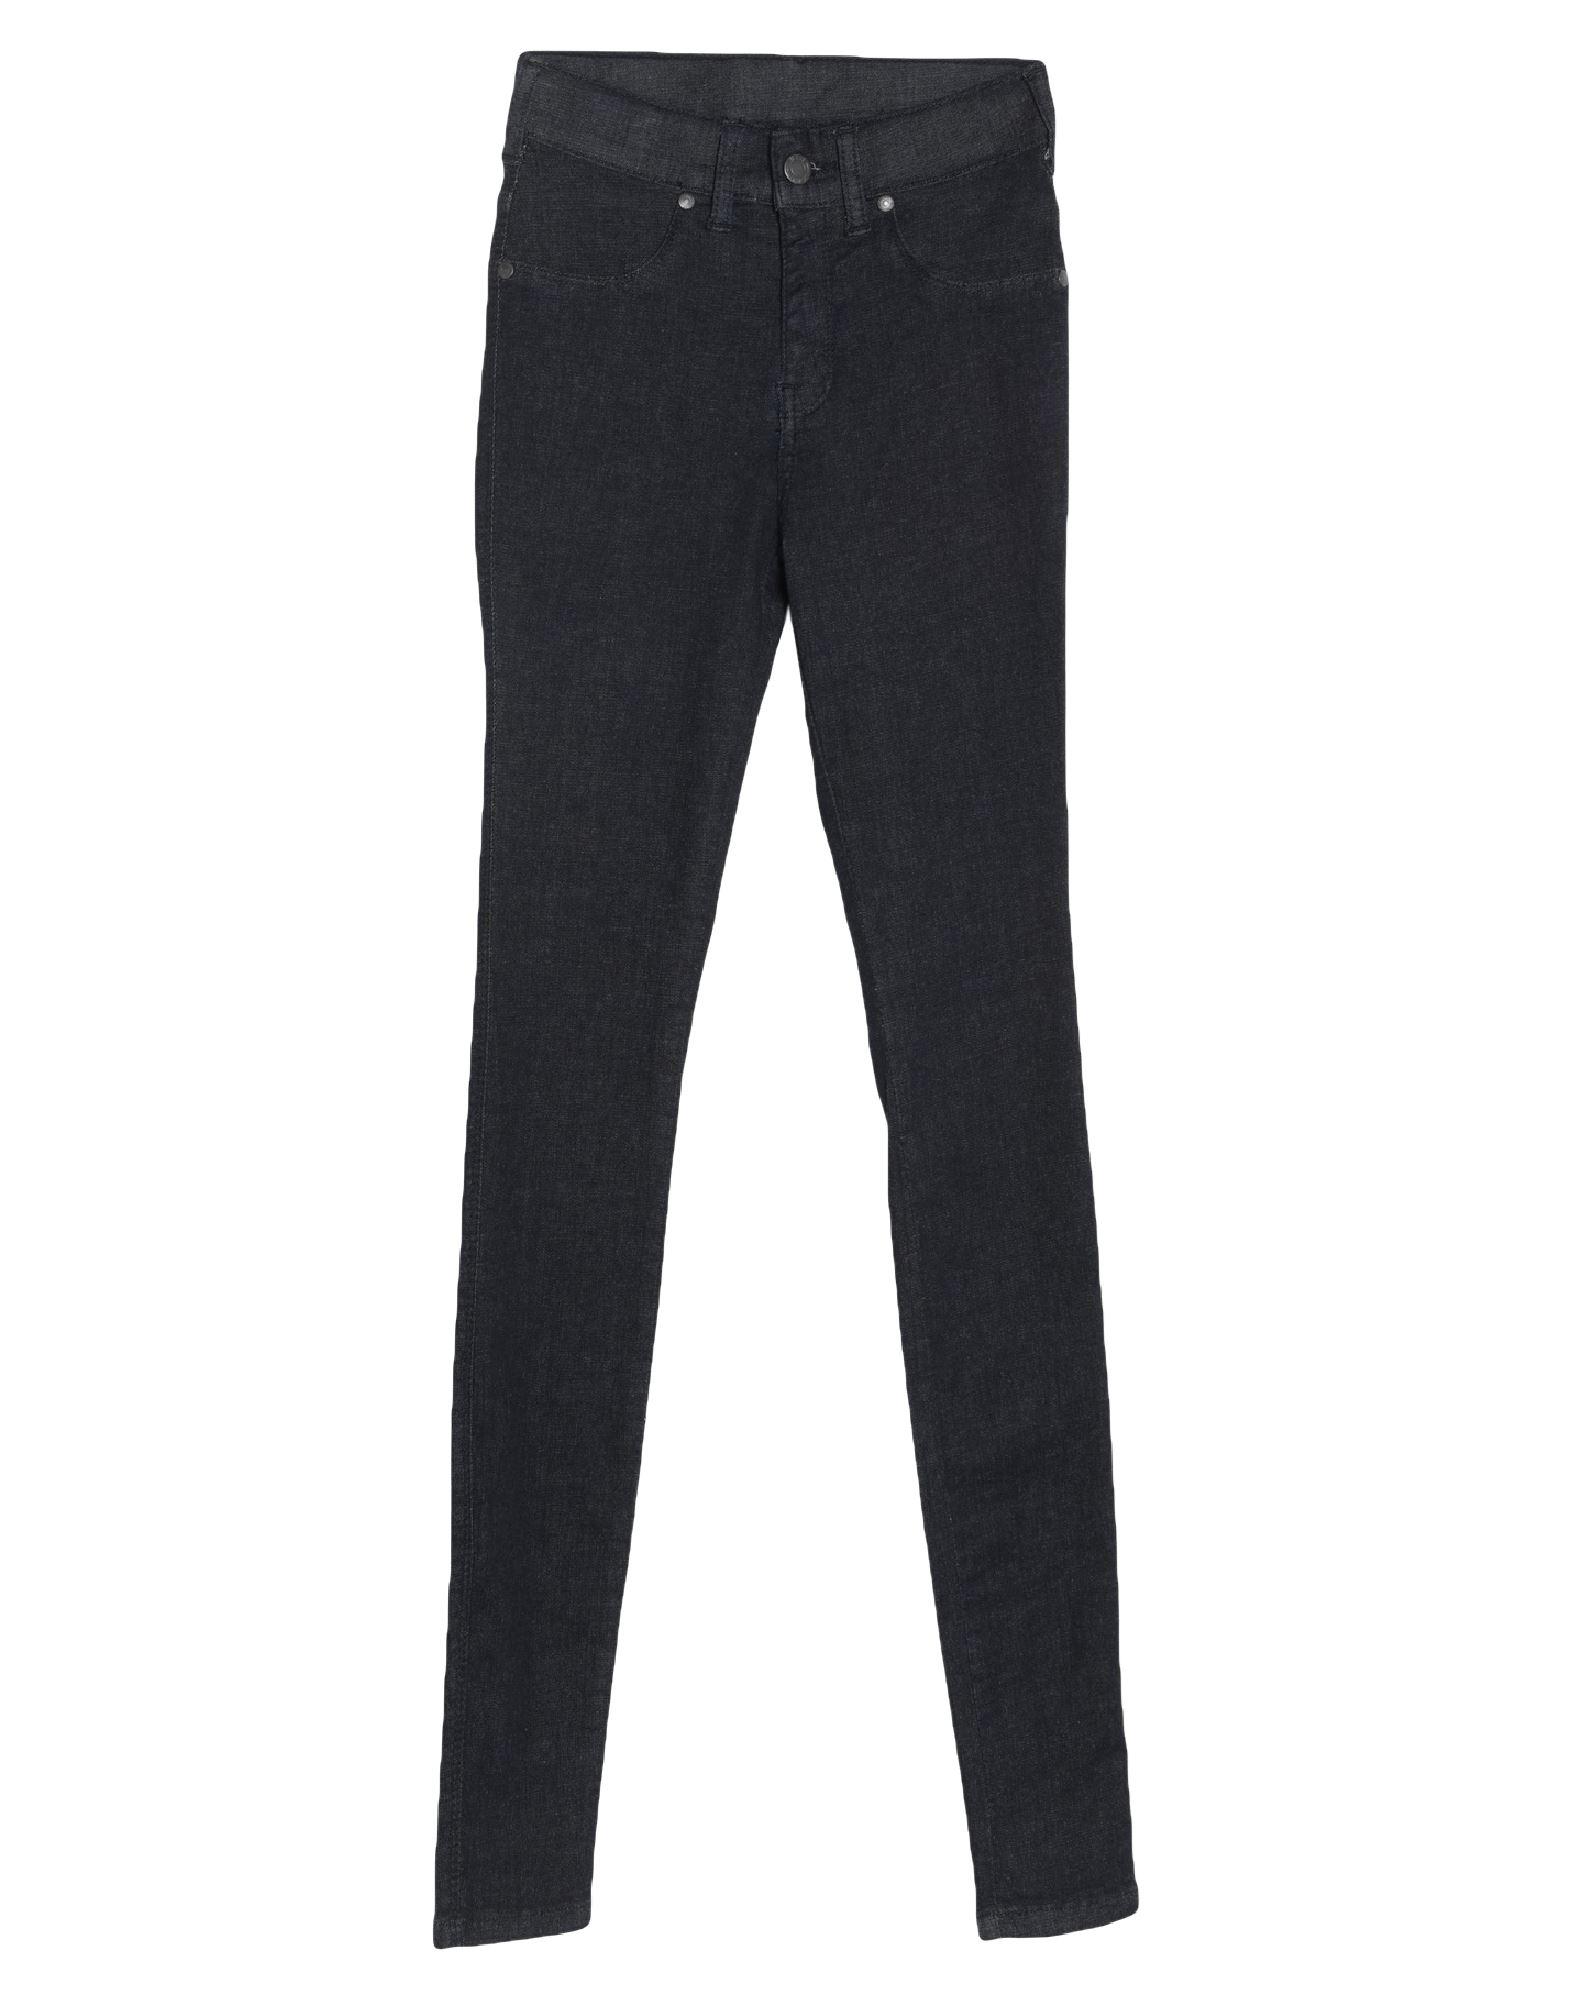 DR. DENIM JEANSMAKERS Джинсовые брюки dr denim jeansmakers комплект белья